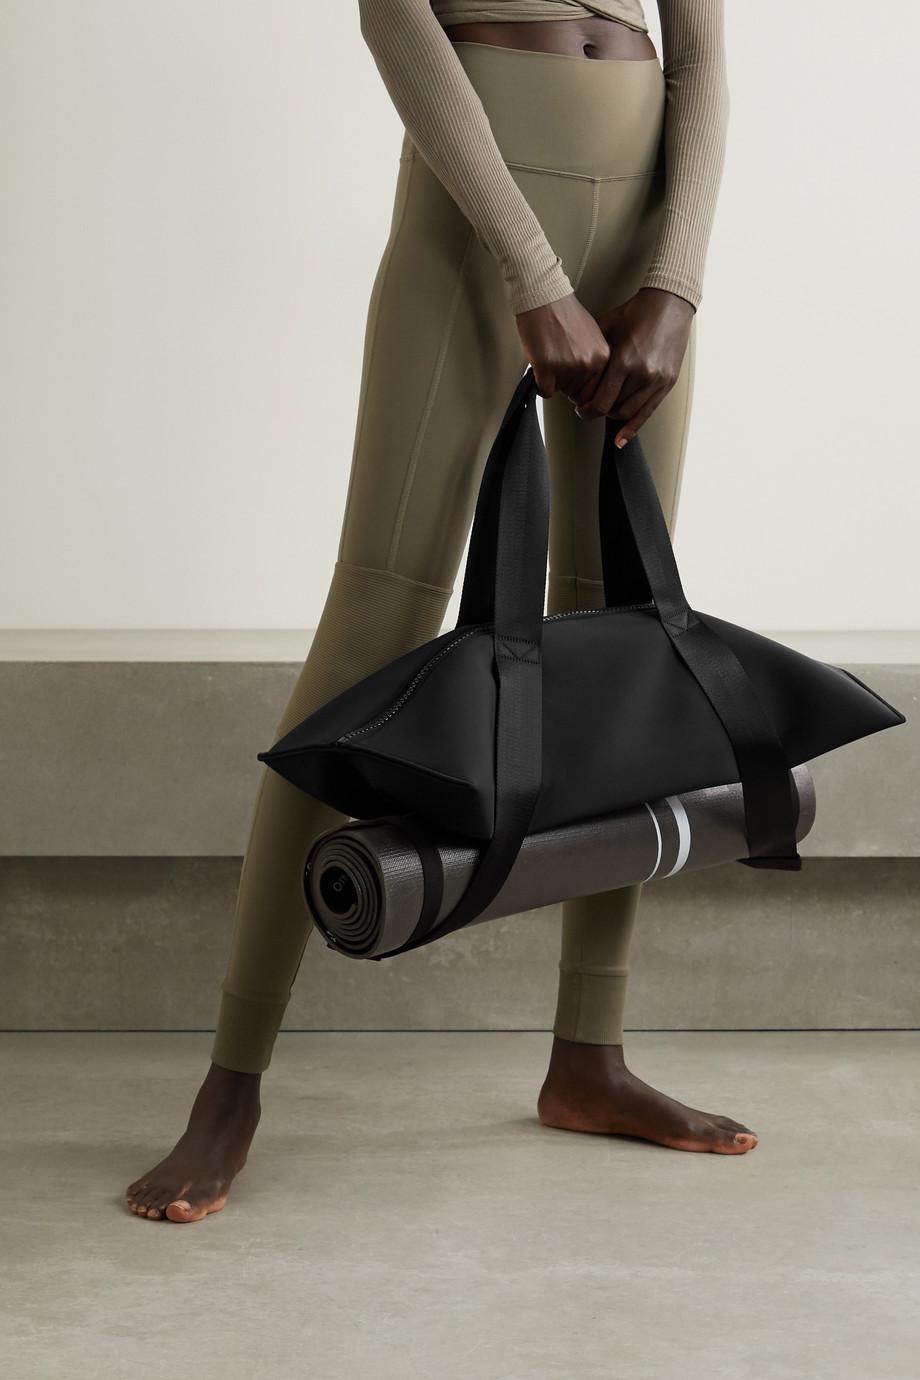 Transience Neoprene yoga bag